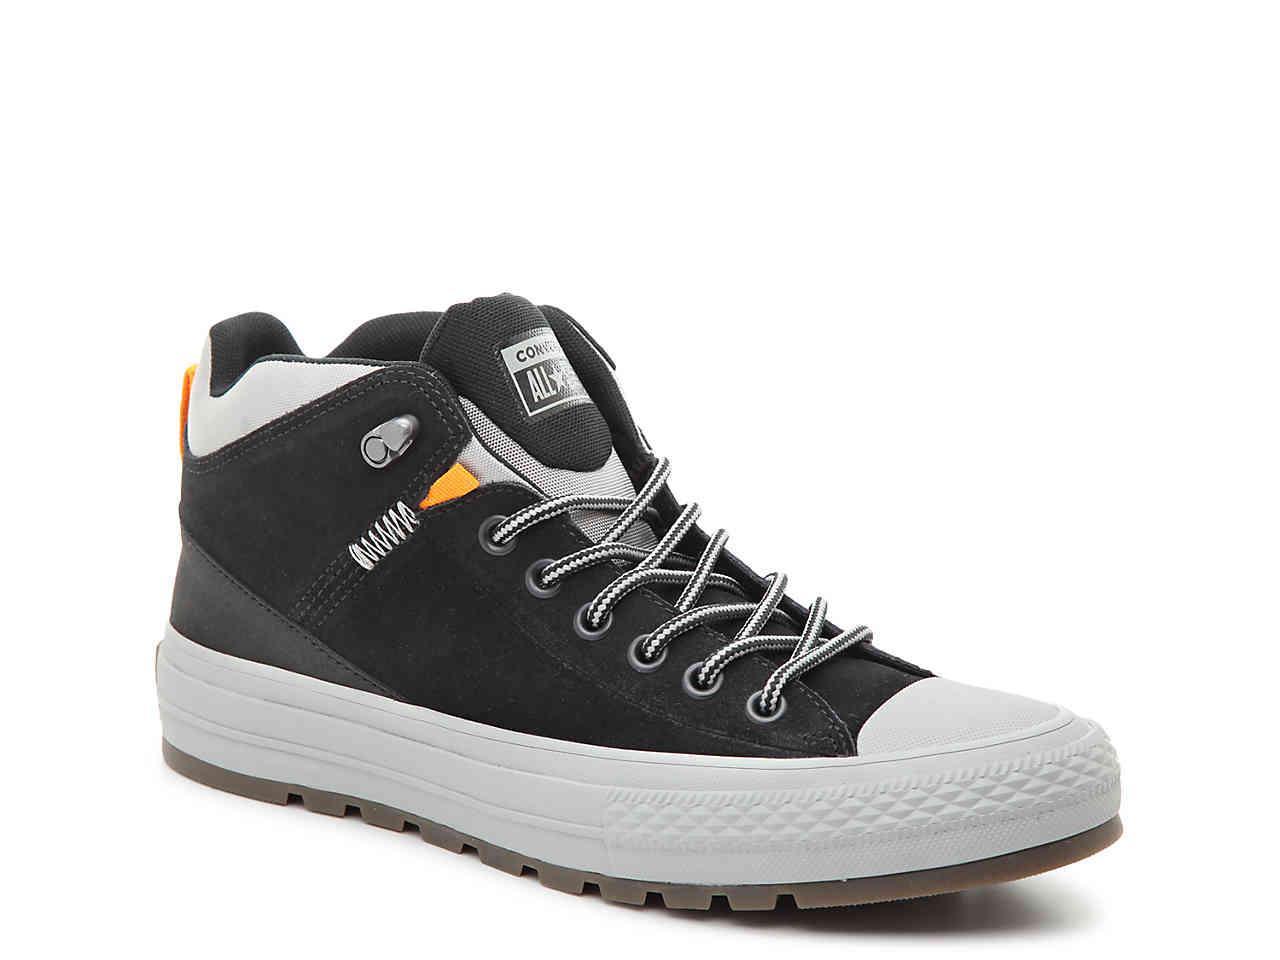 66f71320325c95 Lyst - Converse Chuck Taylor All Star Street Mid-top Sneaker in Black